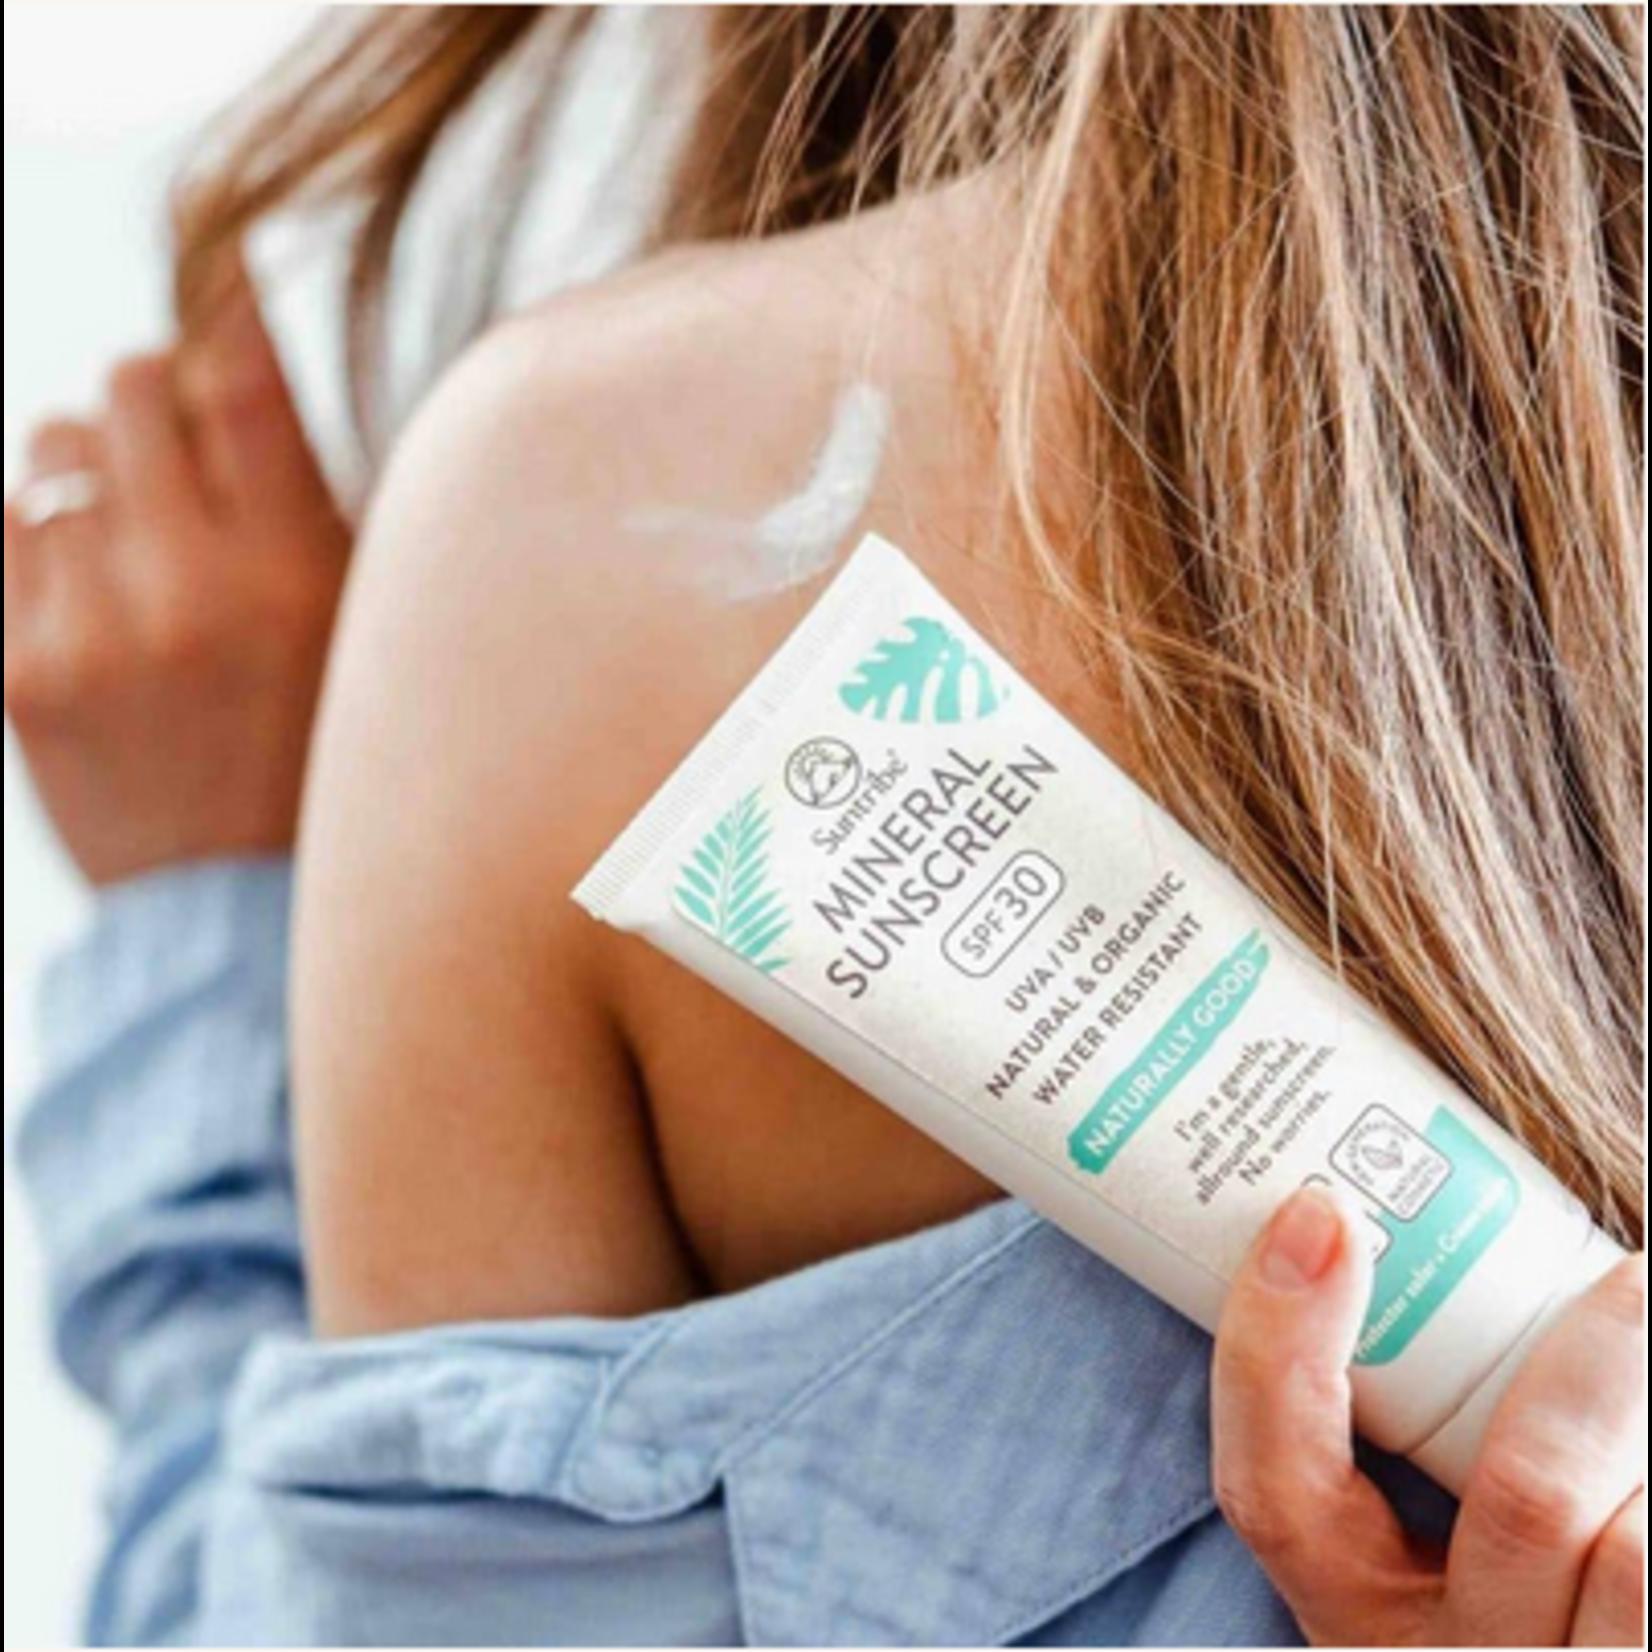 Suntribe Suntribe All Natural Mineral Body & Face Sunscreen SPF 30